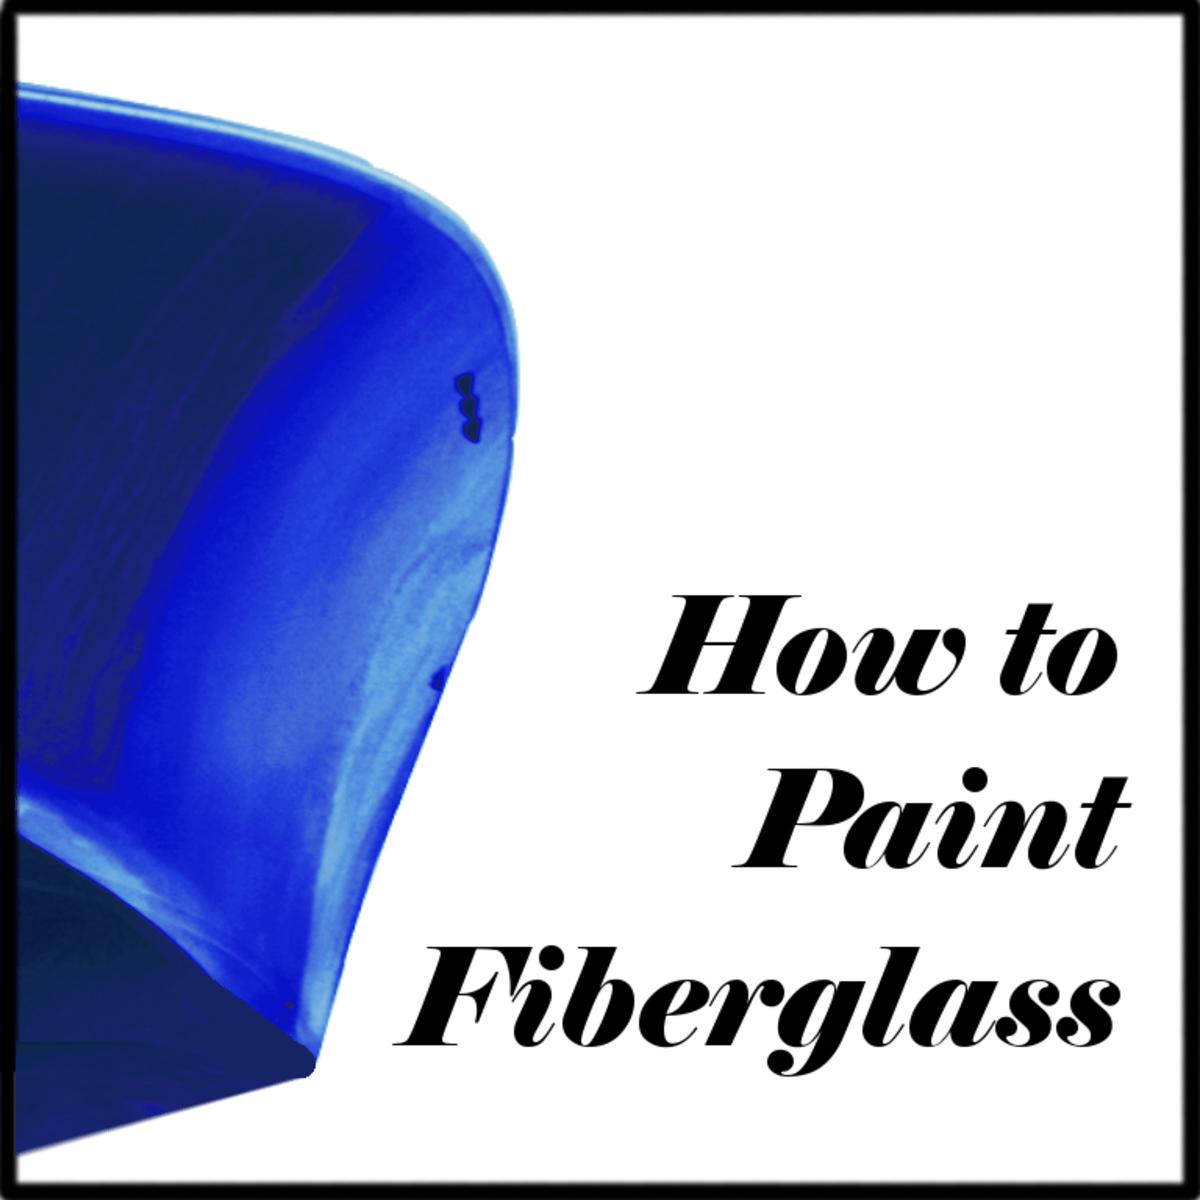 How to Paint Fiberglass